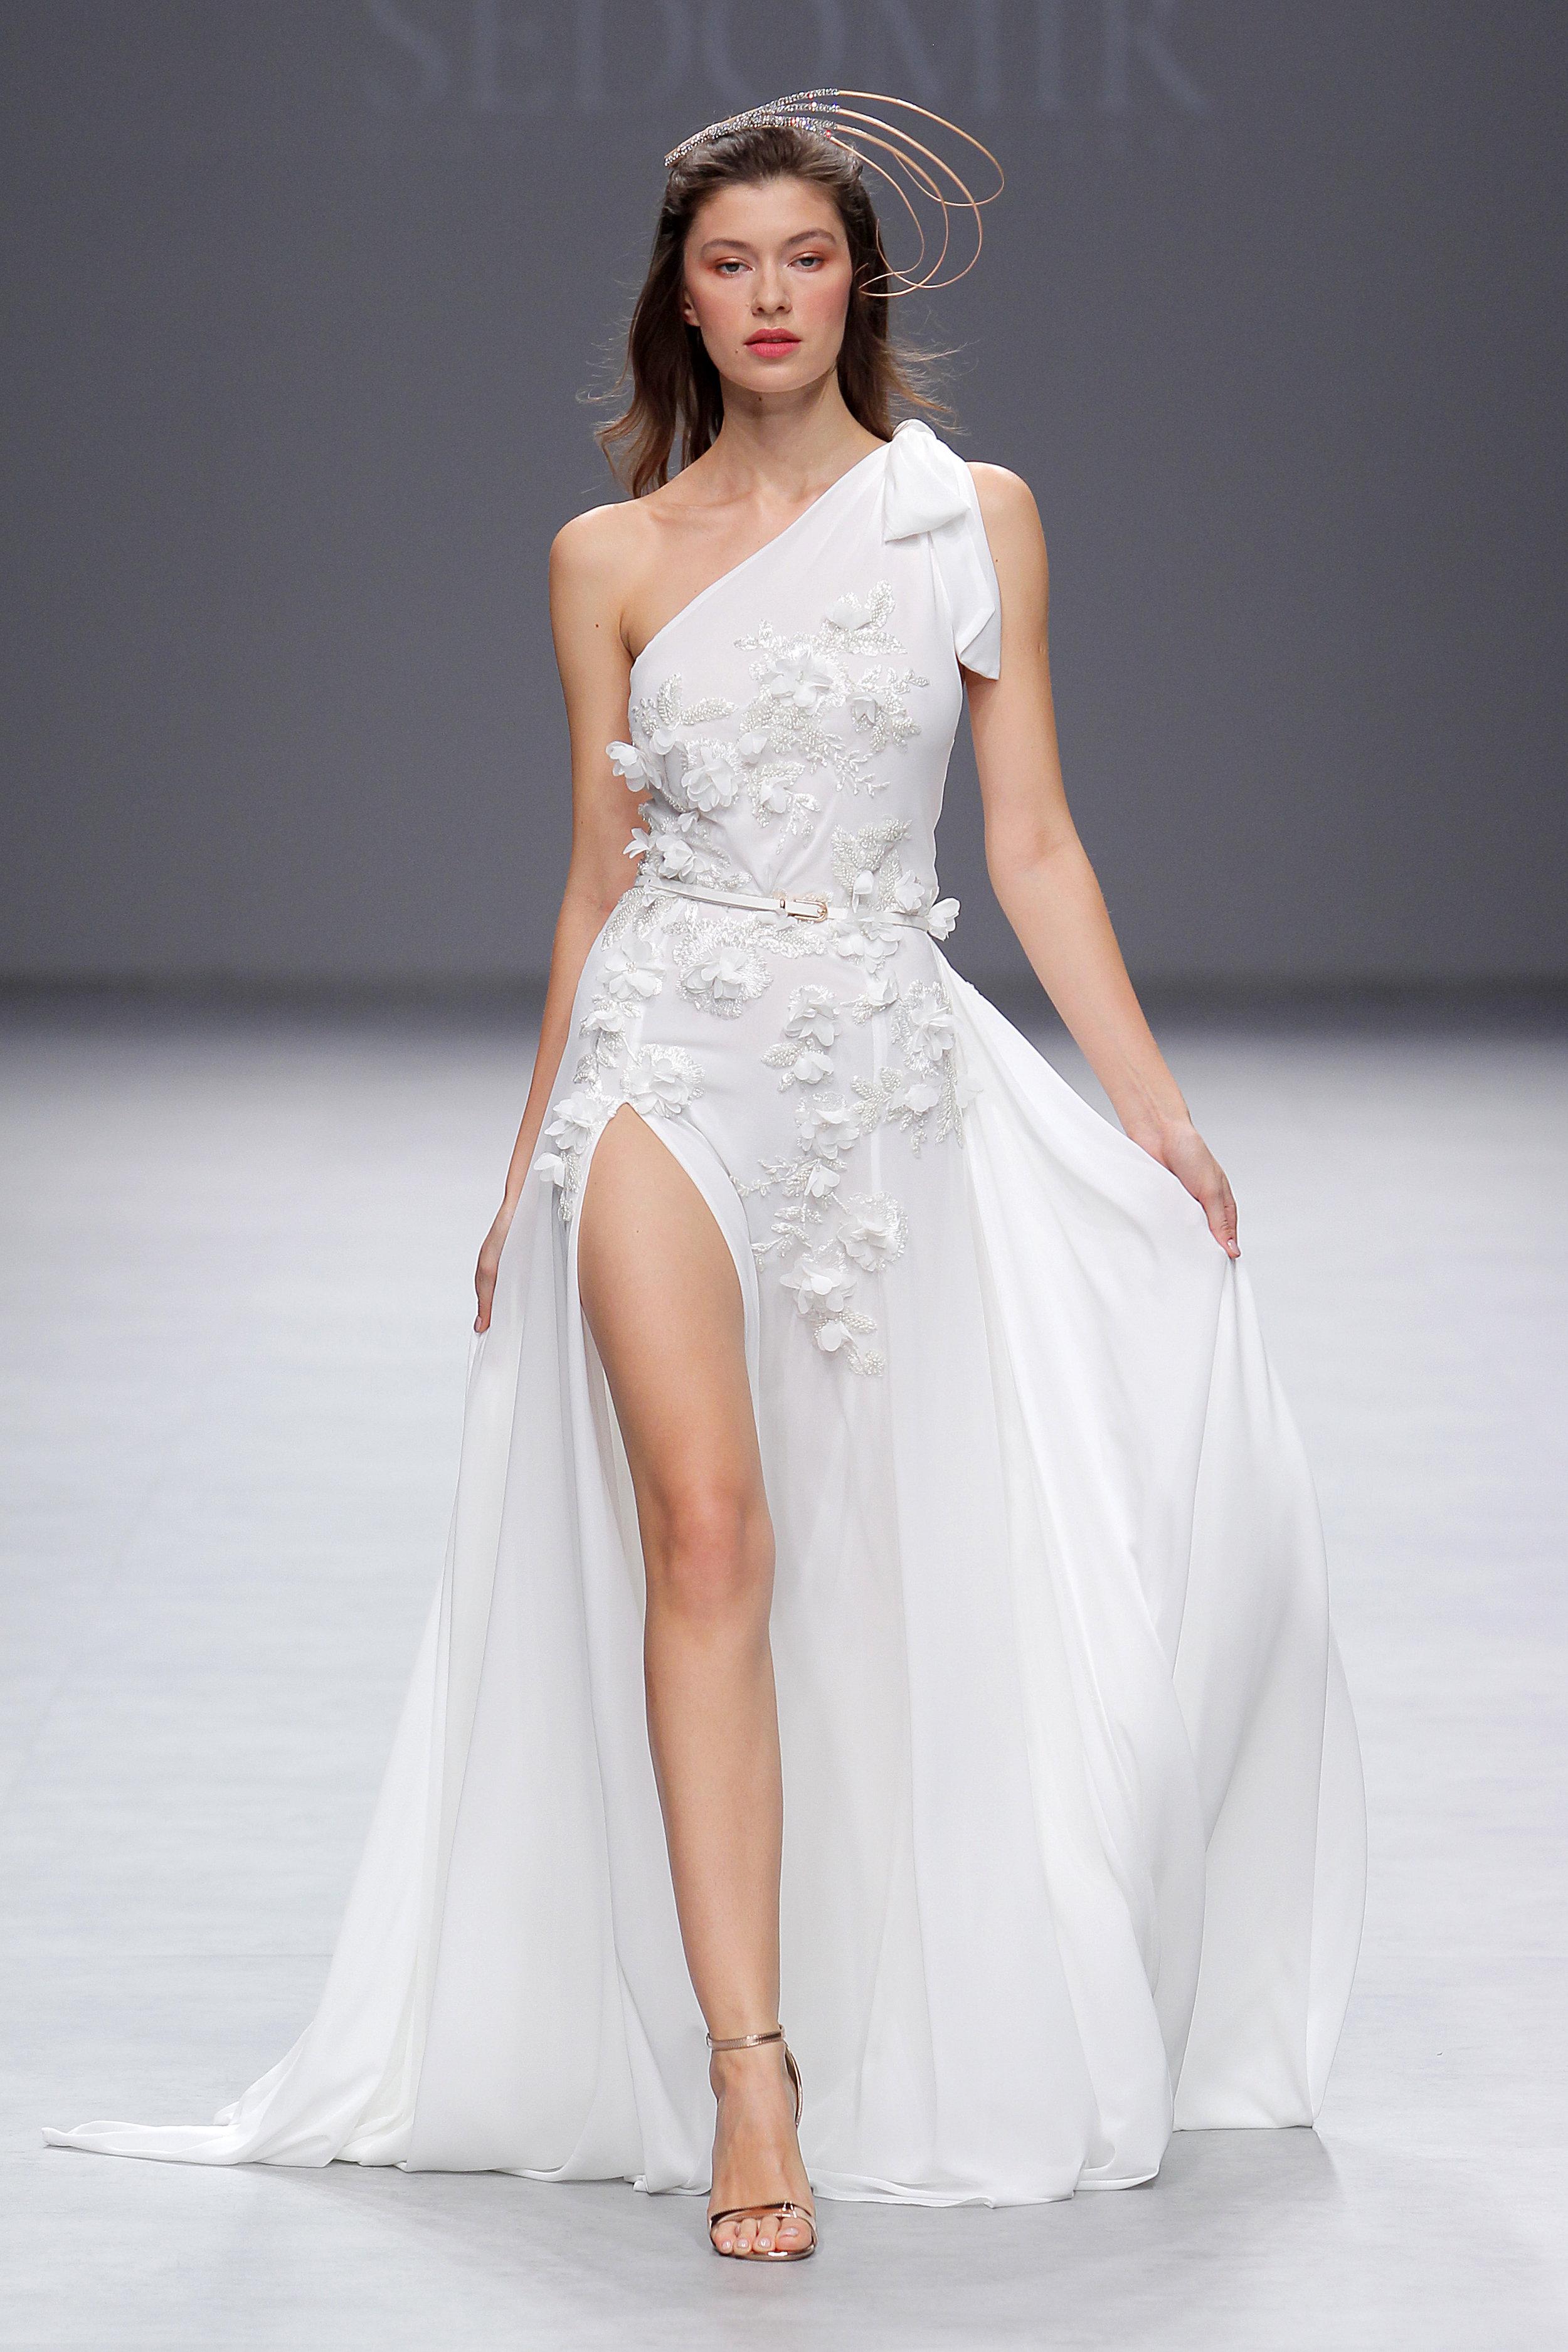 Designer: Sedomir Rodriguez de la Sierra - Pasarela:   Valmont Barcelona Bridal Fashion Week